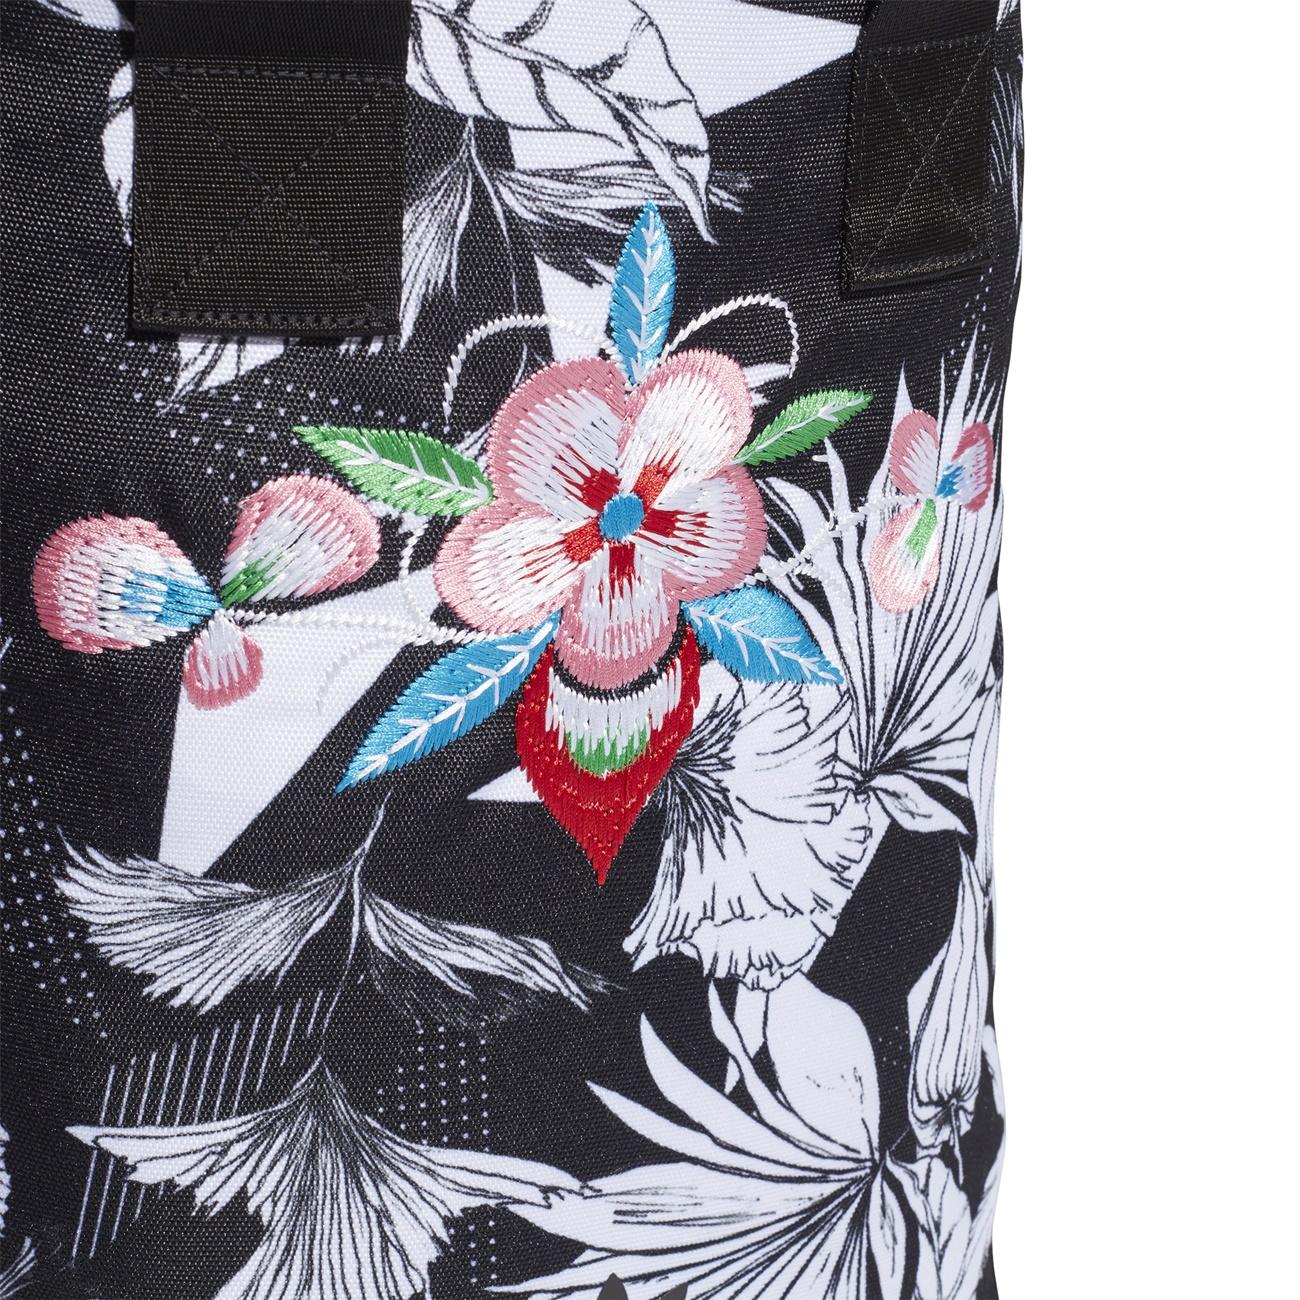 Adidas Originals Bag Pack Mandala Roll Top Borbomix Passinho rBqrw